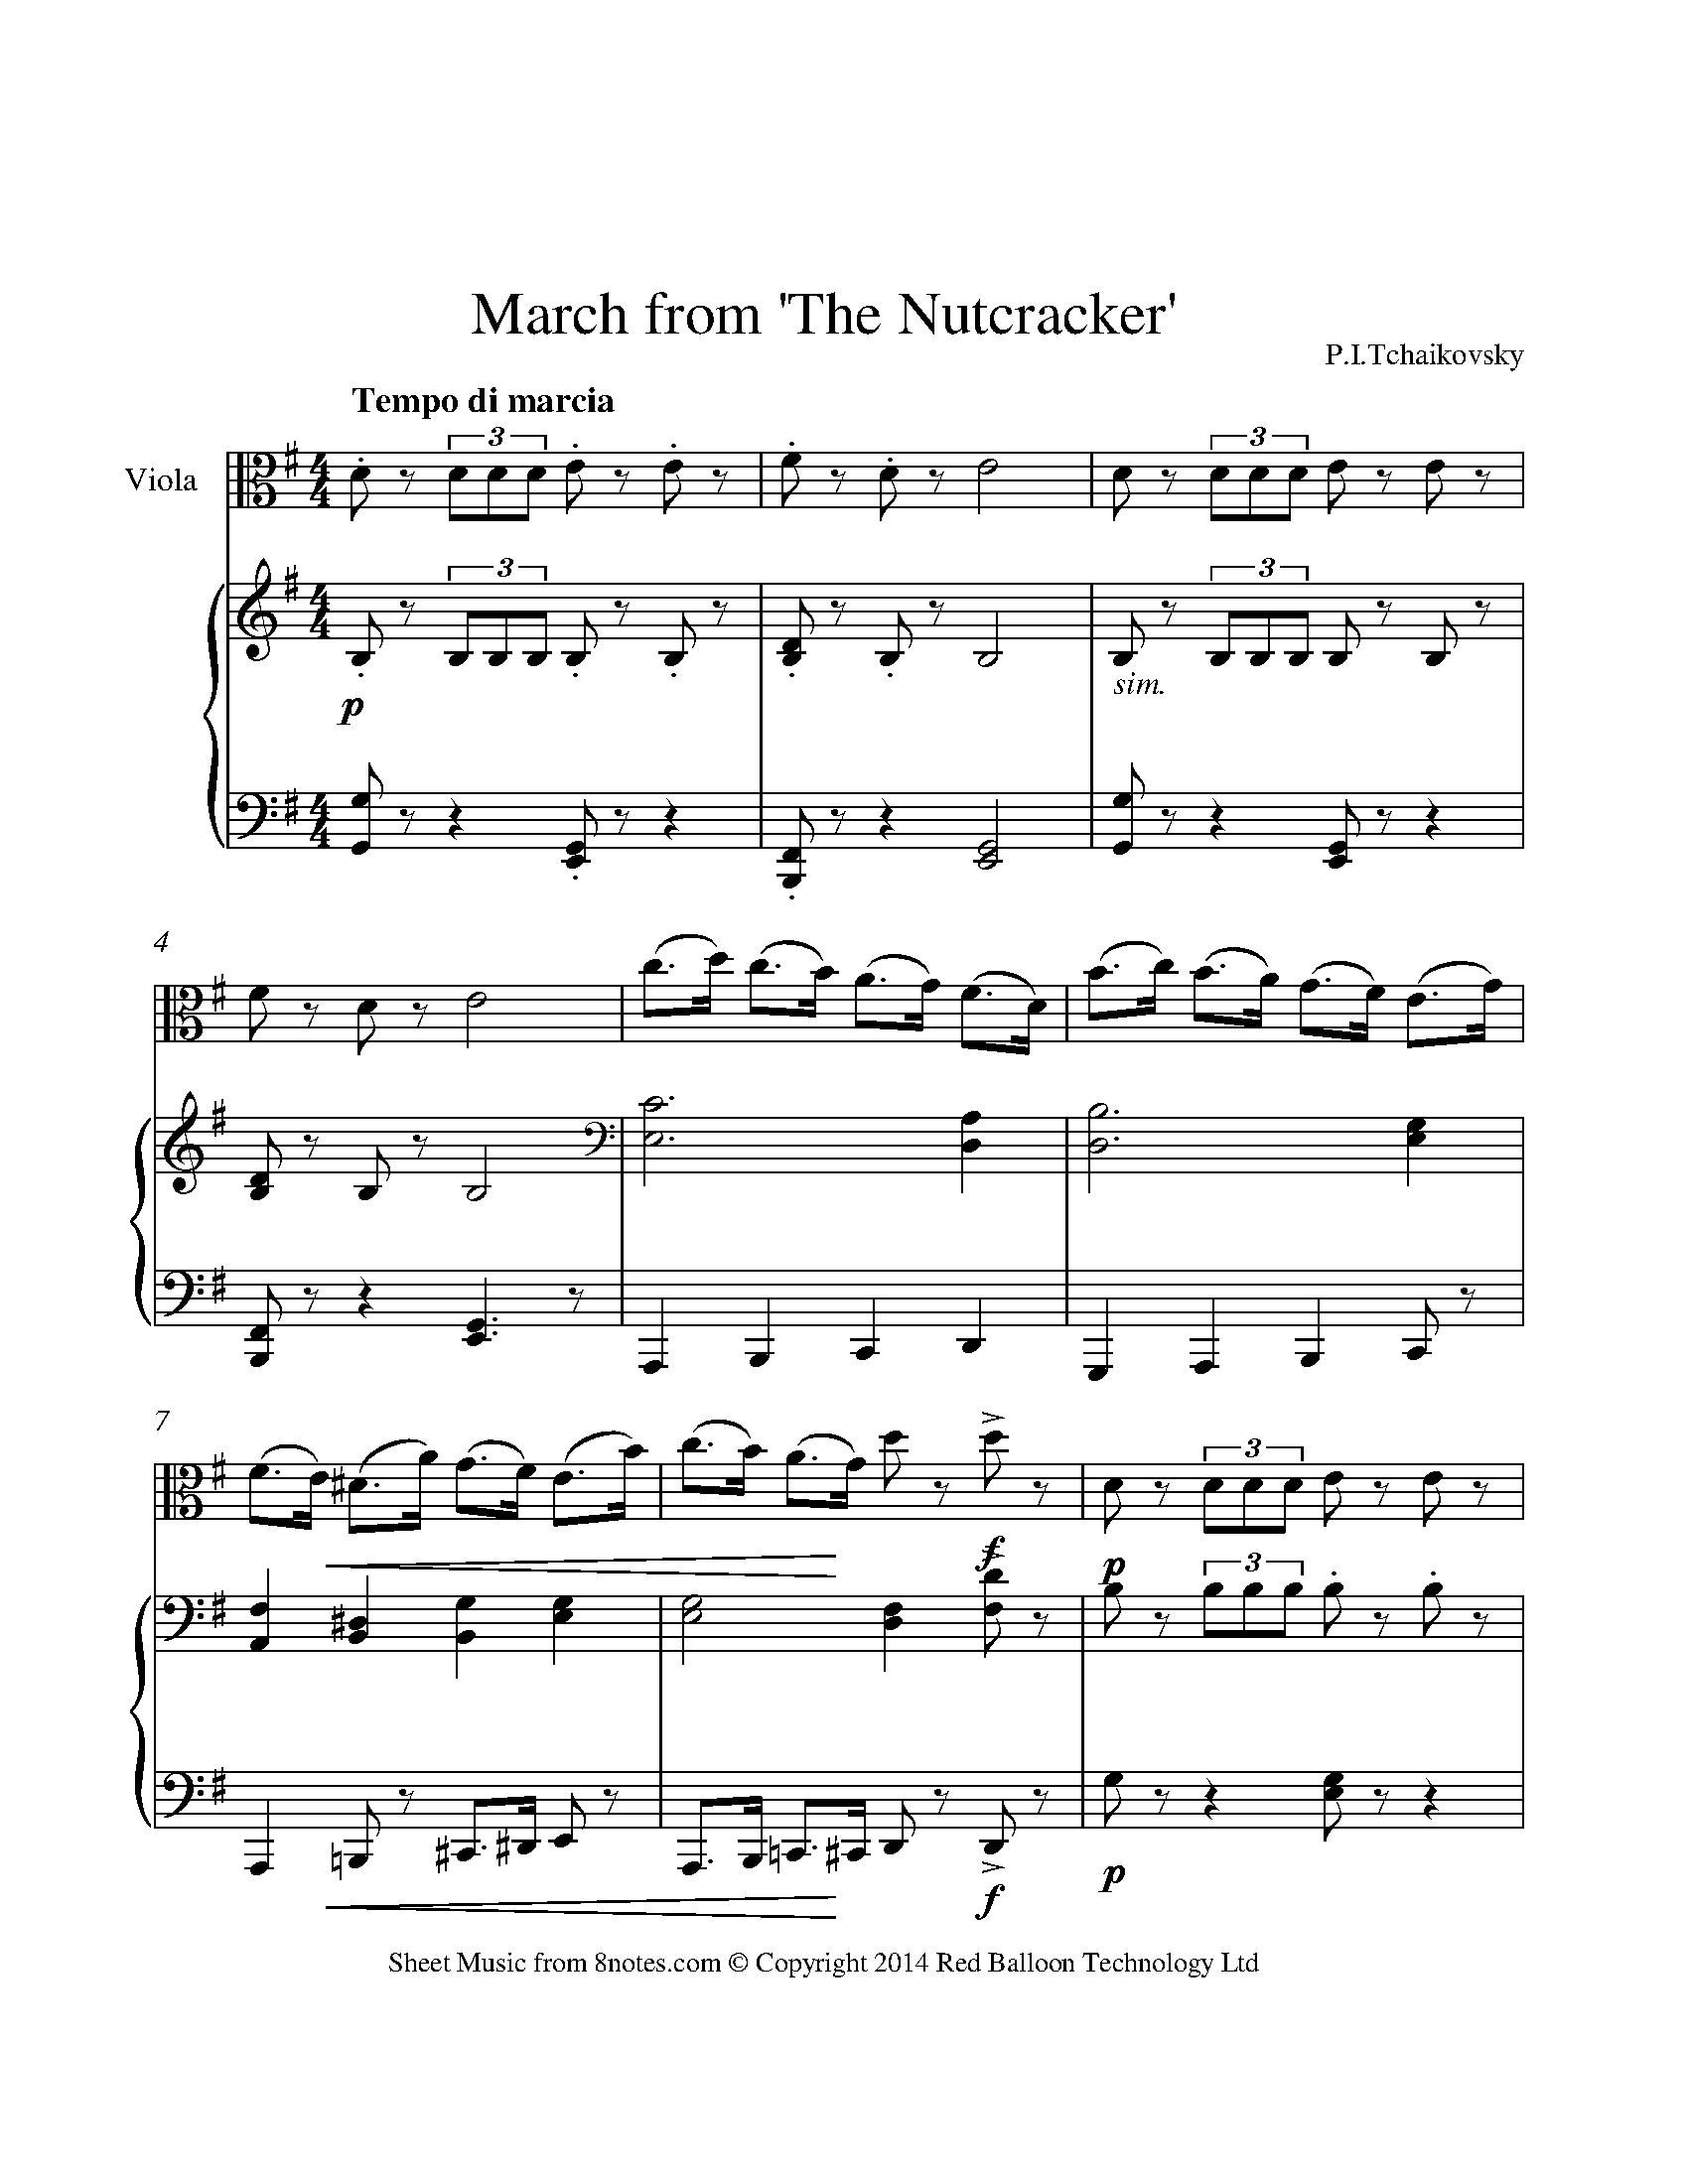 Sad Violin Meme Notes